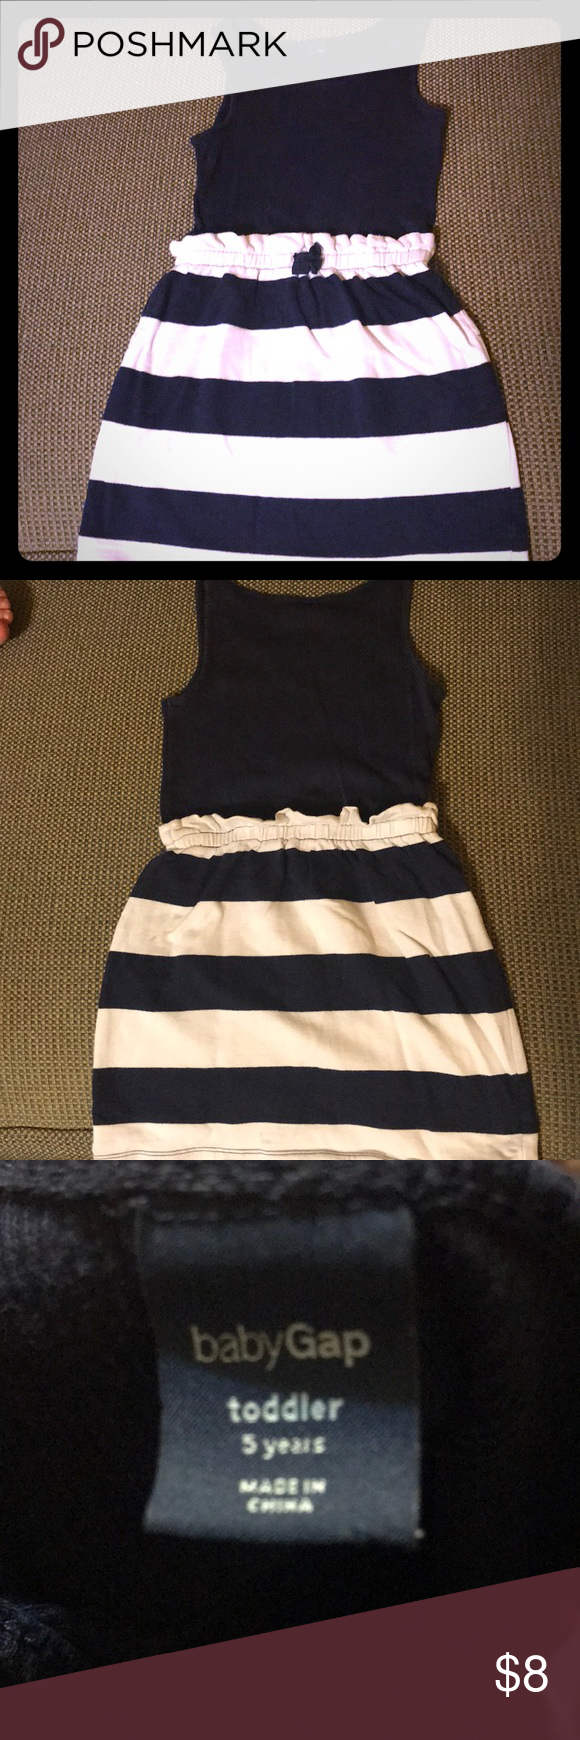 The Cutest Babygap Navy White Girls Dress 5t White Girls Girls Dresses 5t Girls White Dress [ 1740 x 580 Pixel ]